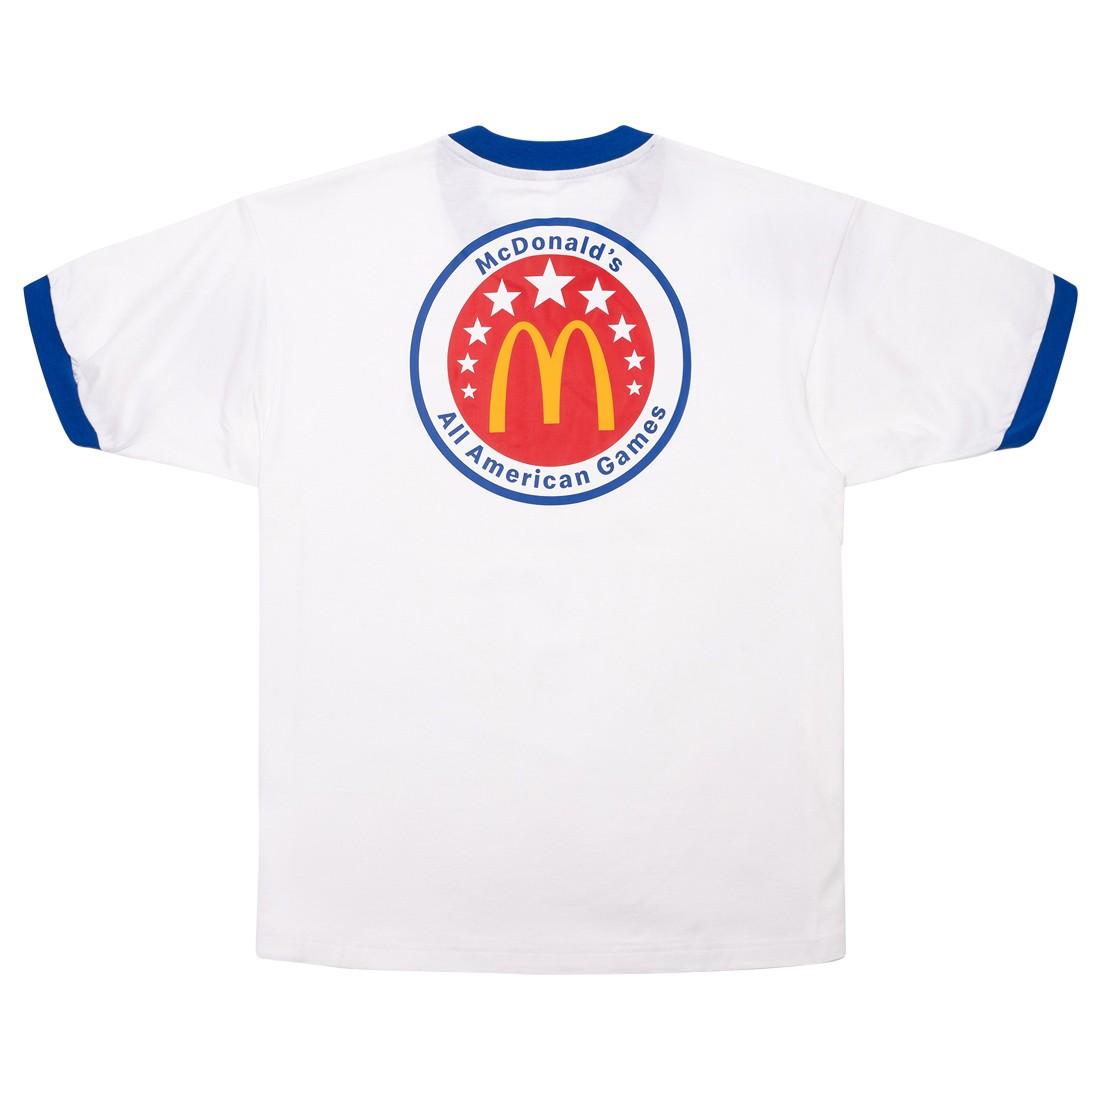 Adidas x Eric Emanuel Men McDonald's All American Game Graphic Tee (white)